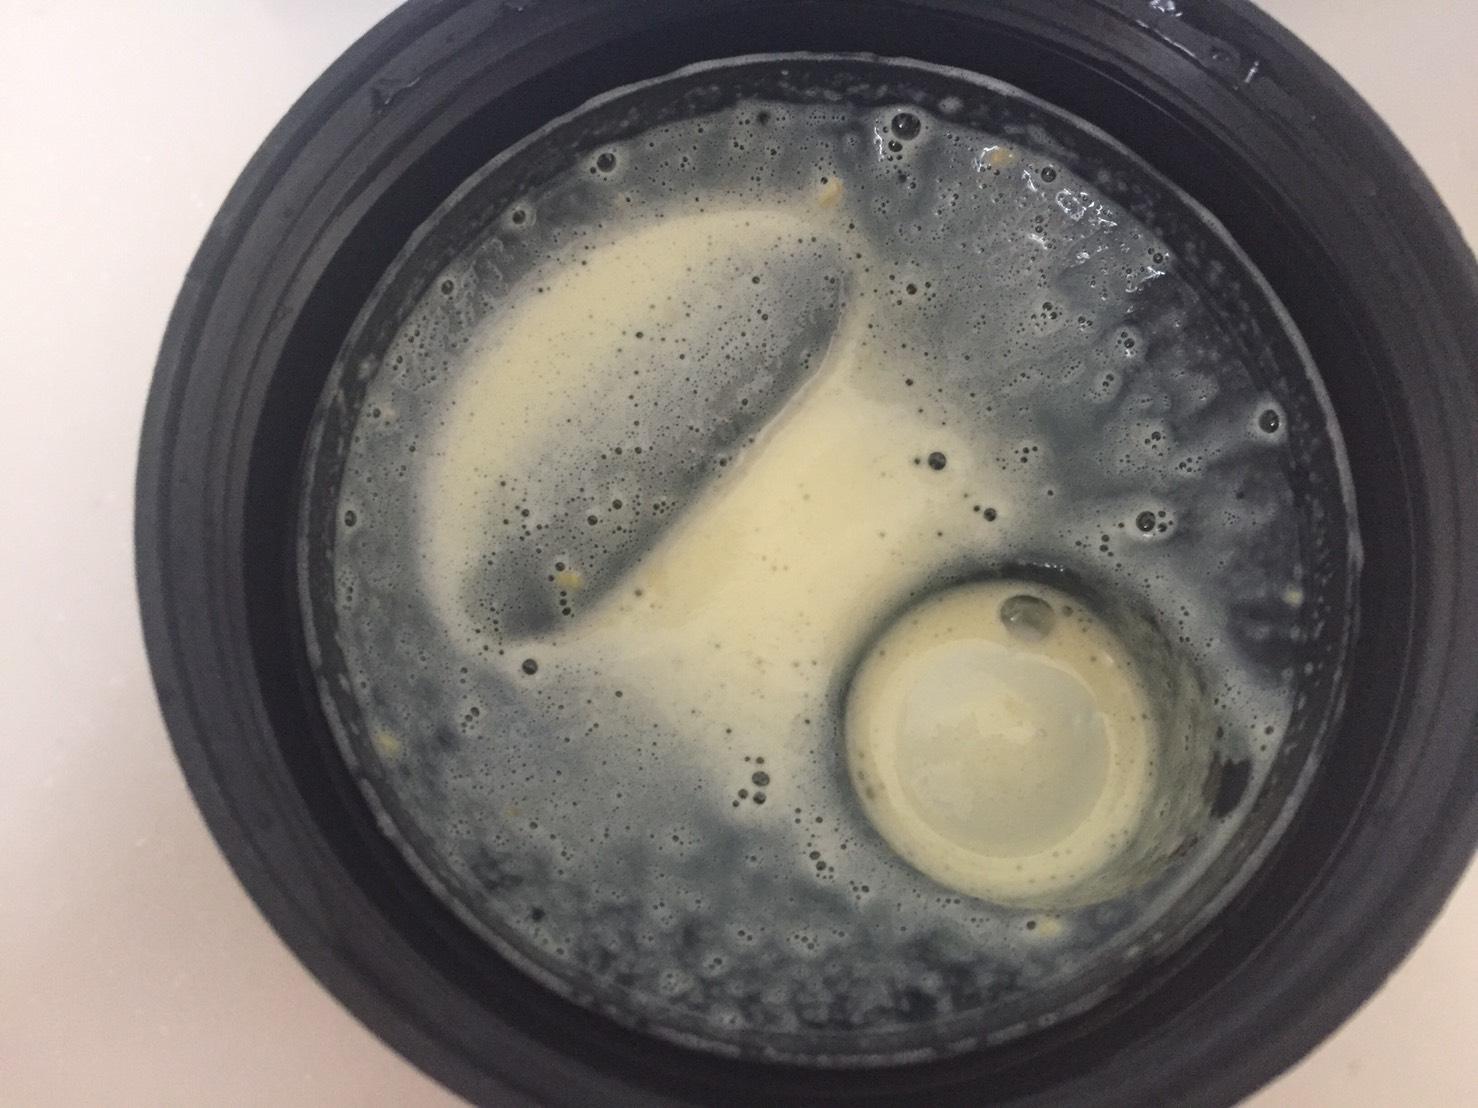 【WPC】Impactホエイプロテイン「Natural Banana(ナチュラルバナナ味)」を牛乳で溶かした時の様子。蓋側